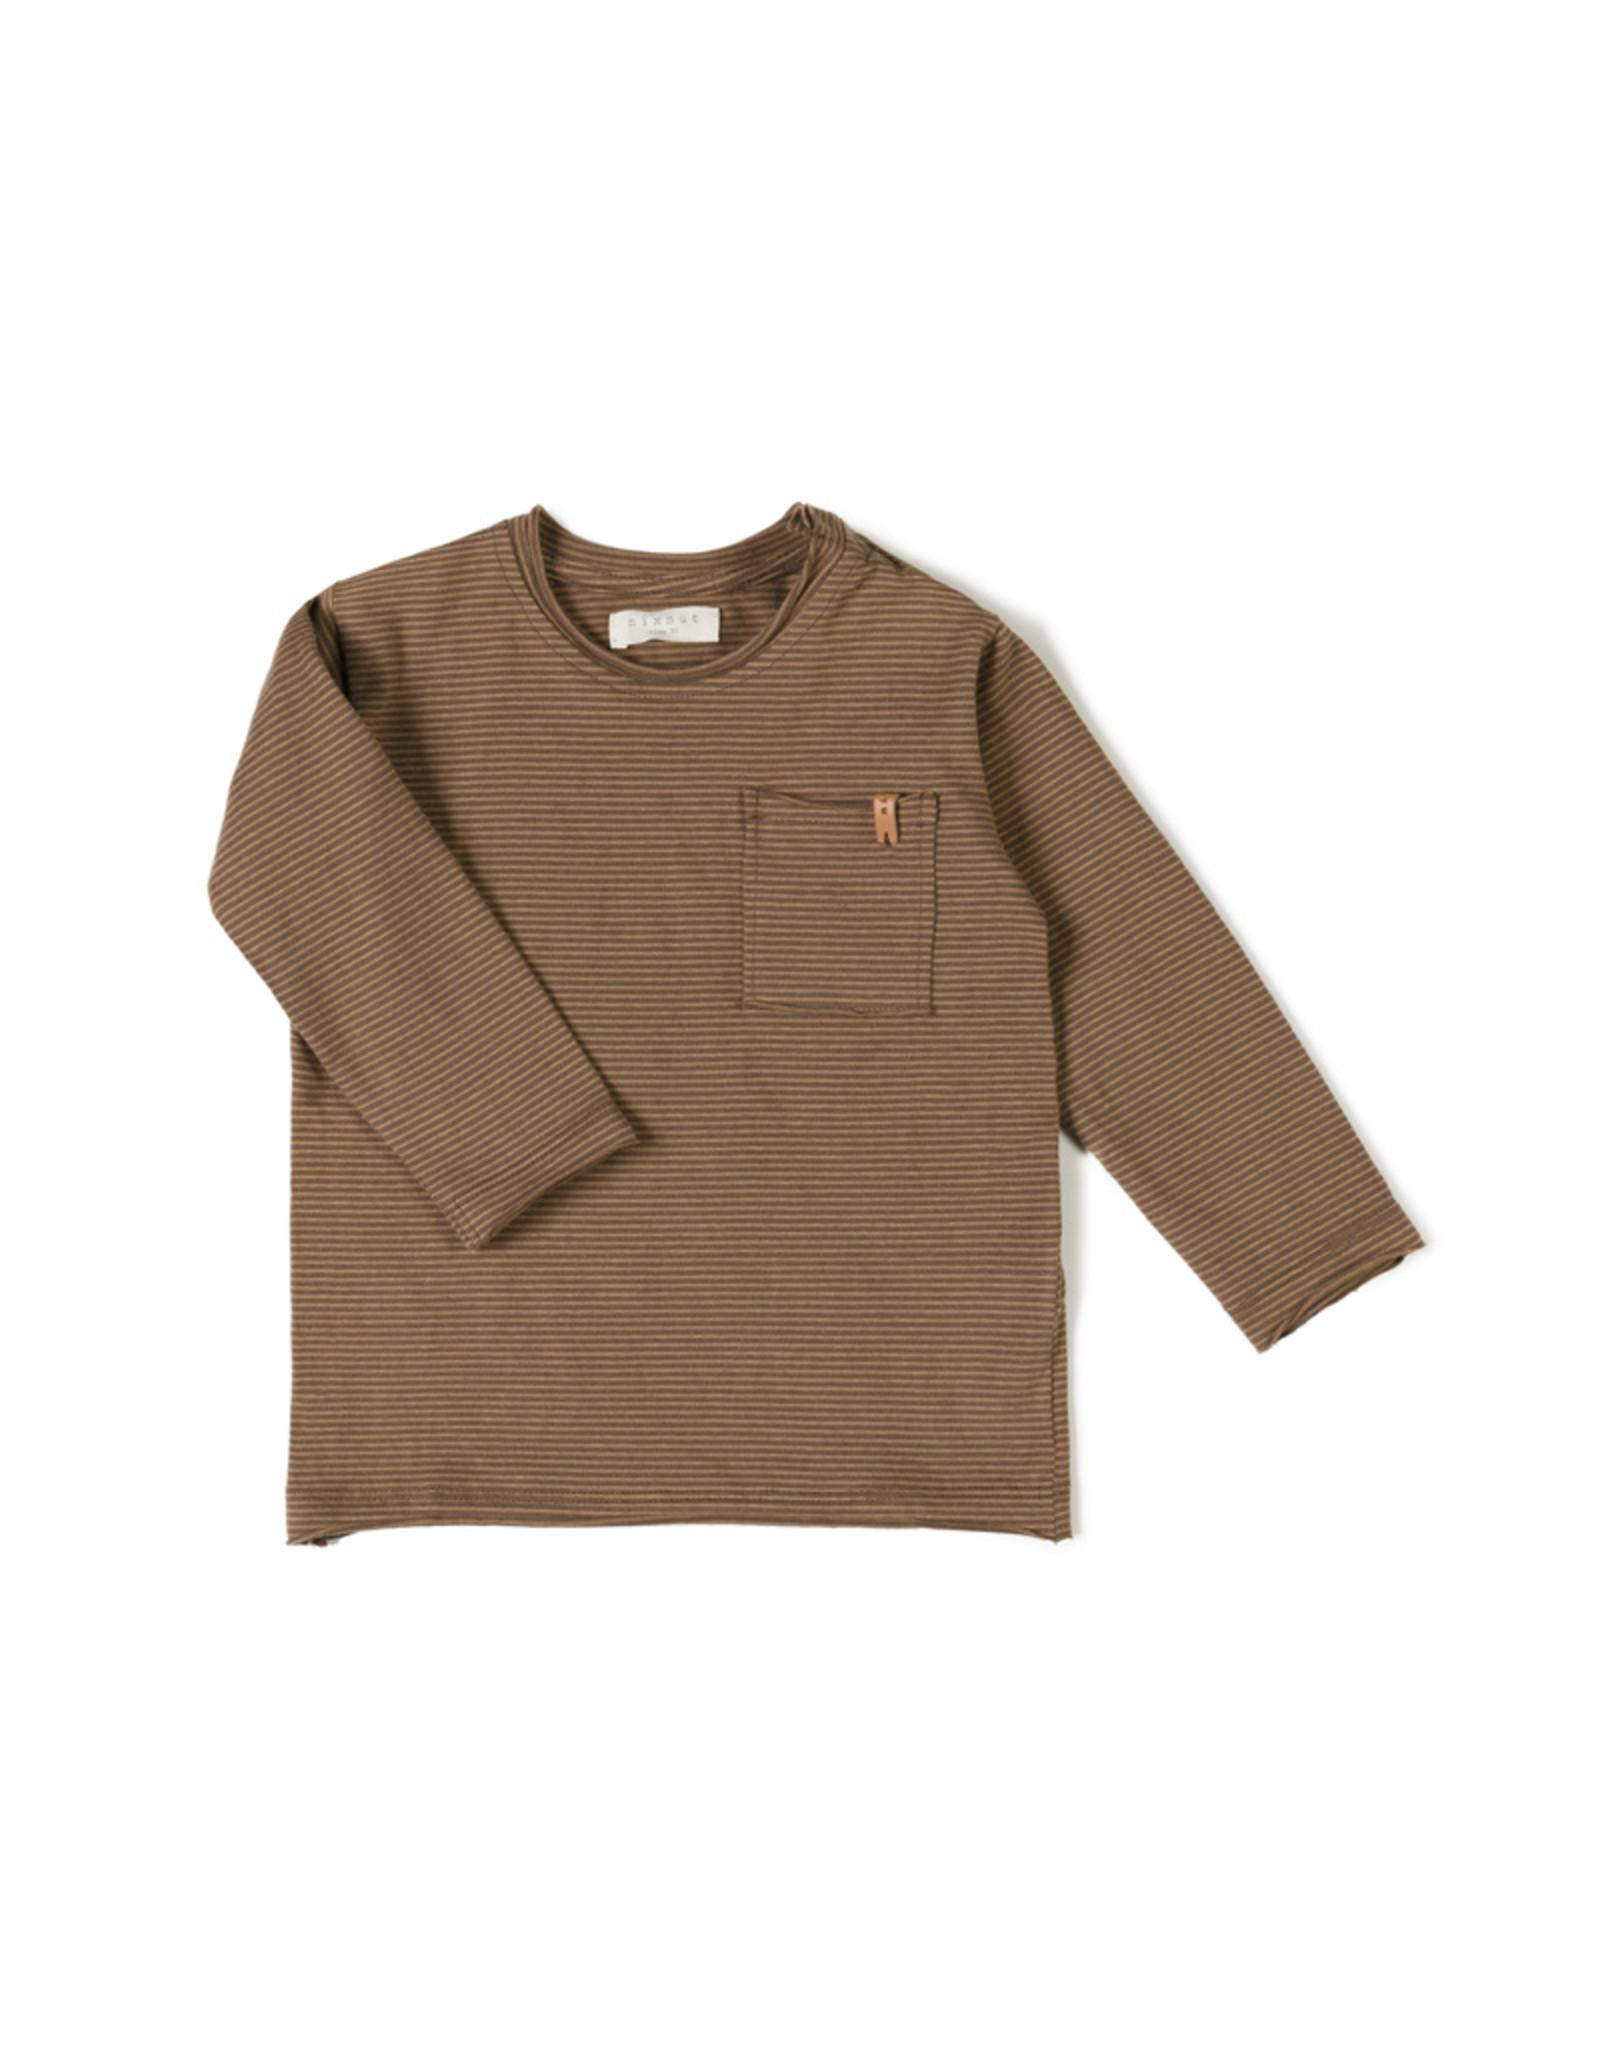 Nixnut T-shirt ligné - Toffee